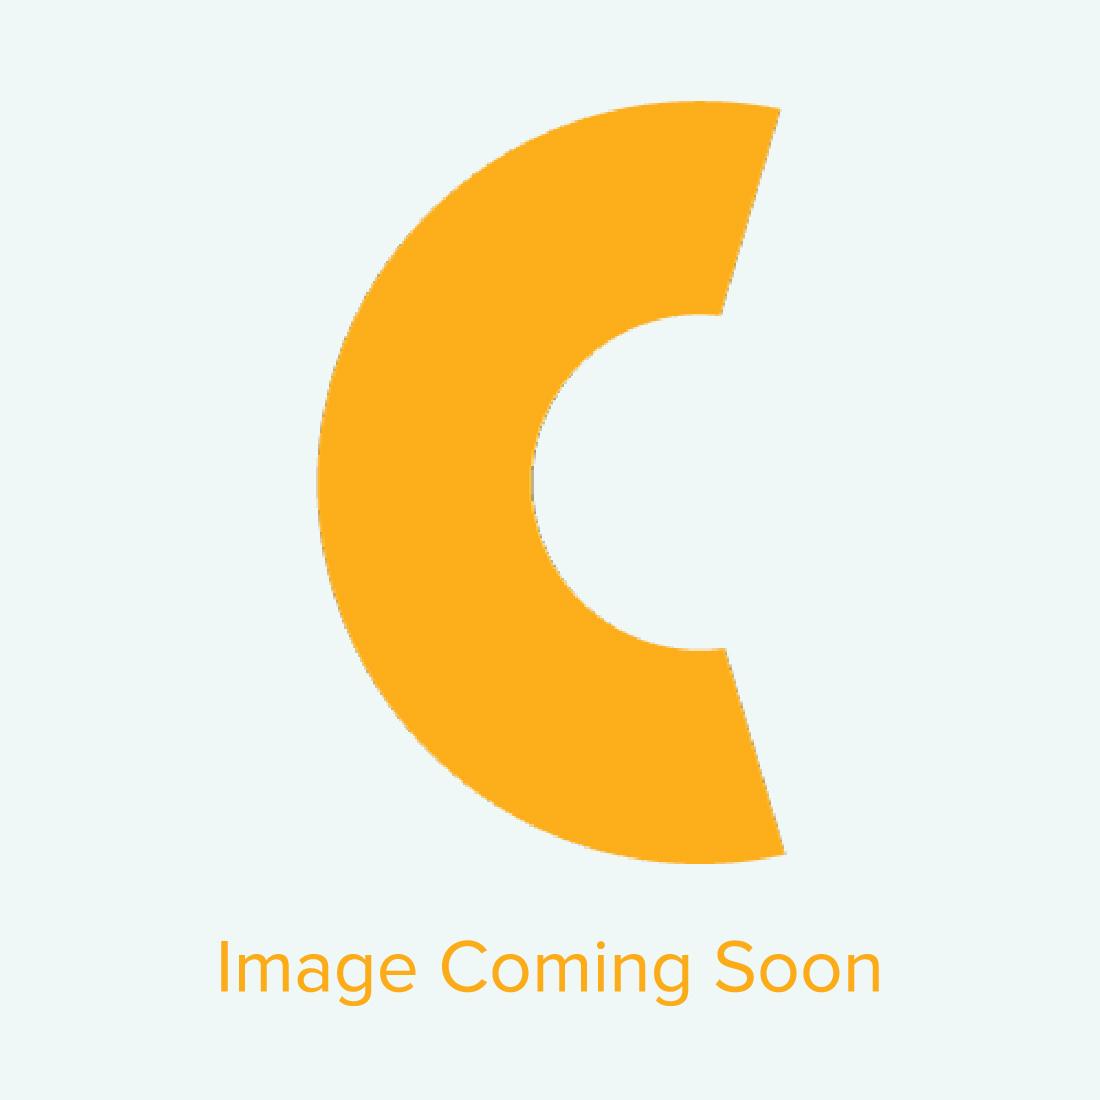 Bella M/C SS6 Heat Fix Rhinestones - 10/bag - CLEARANCE